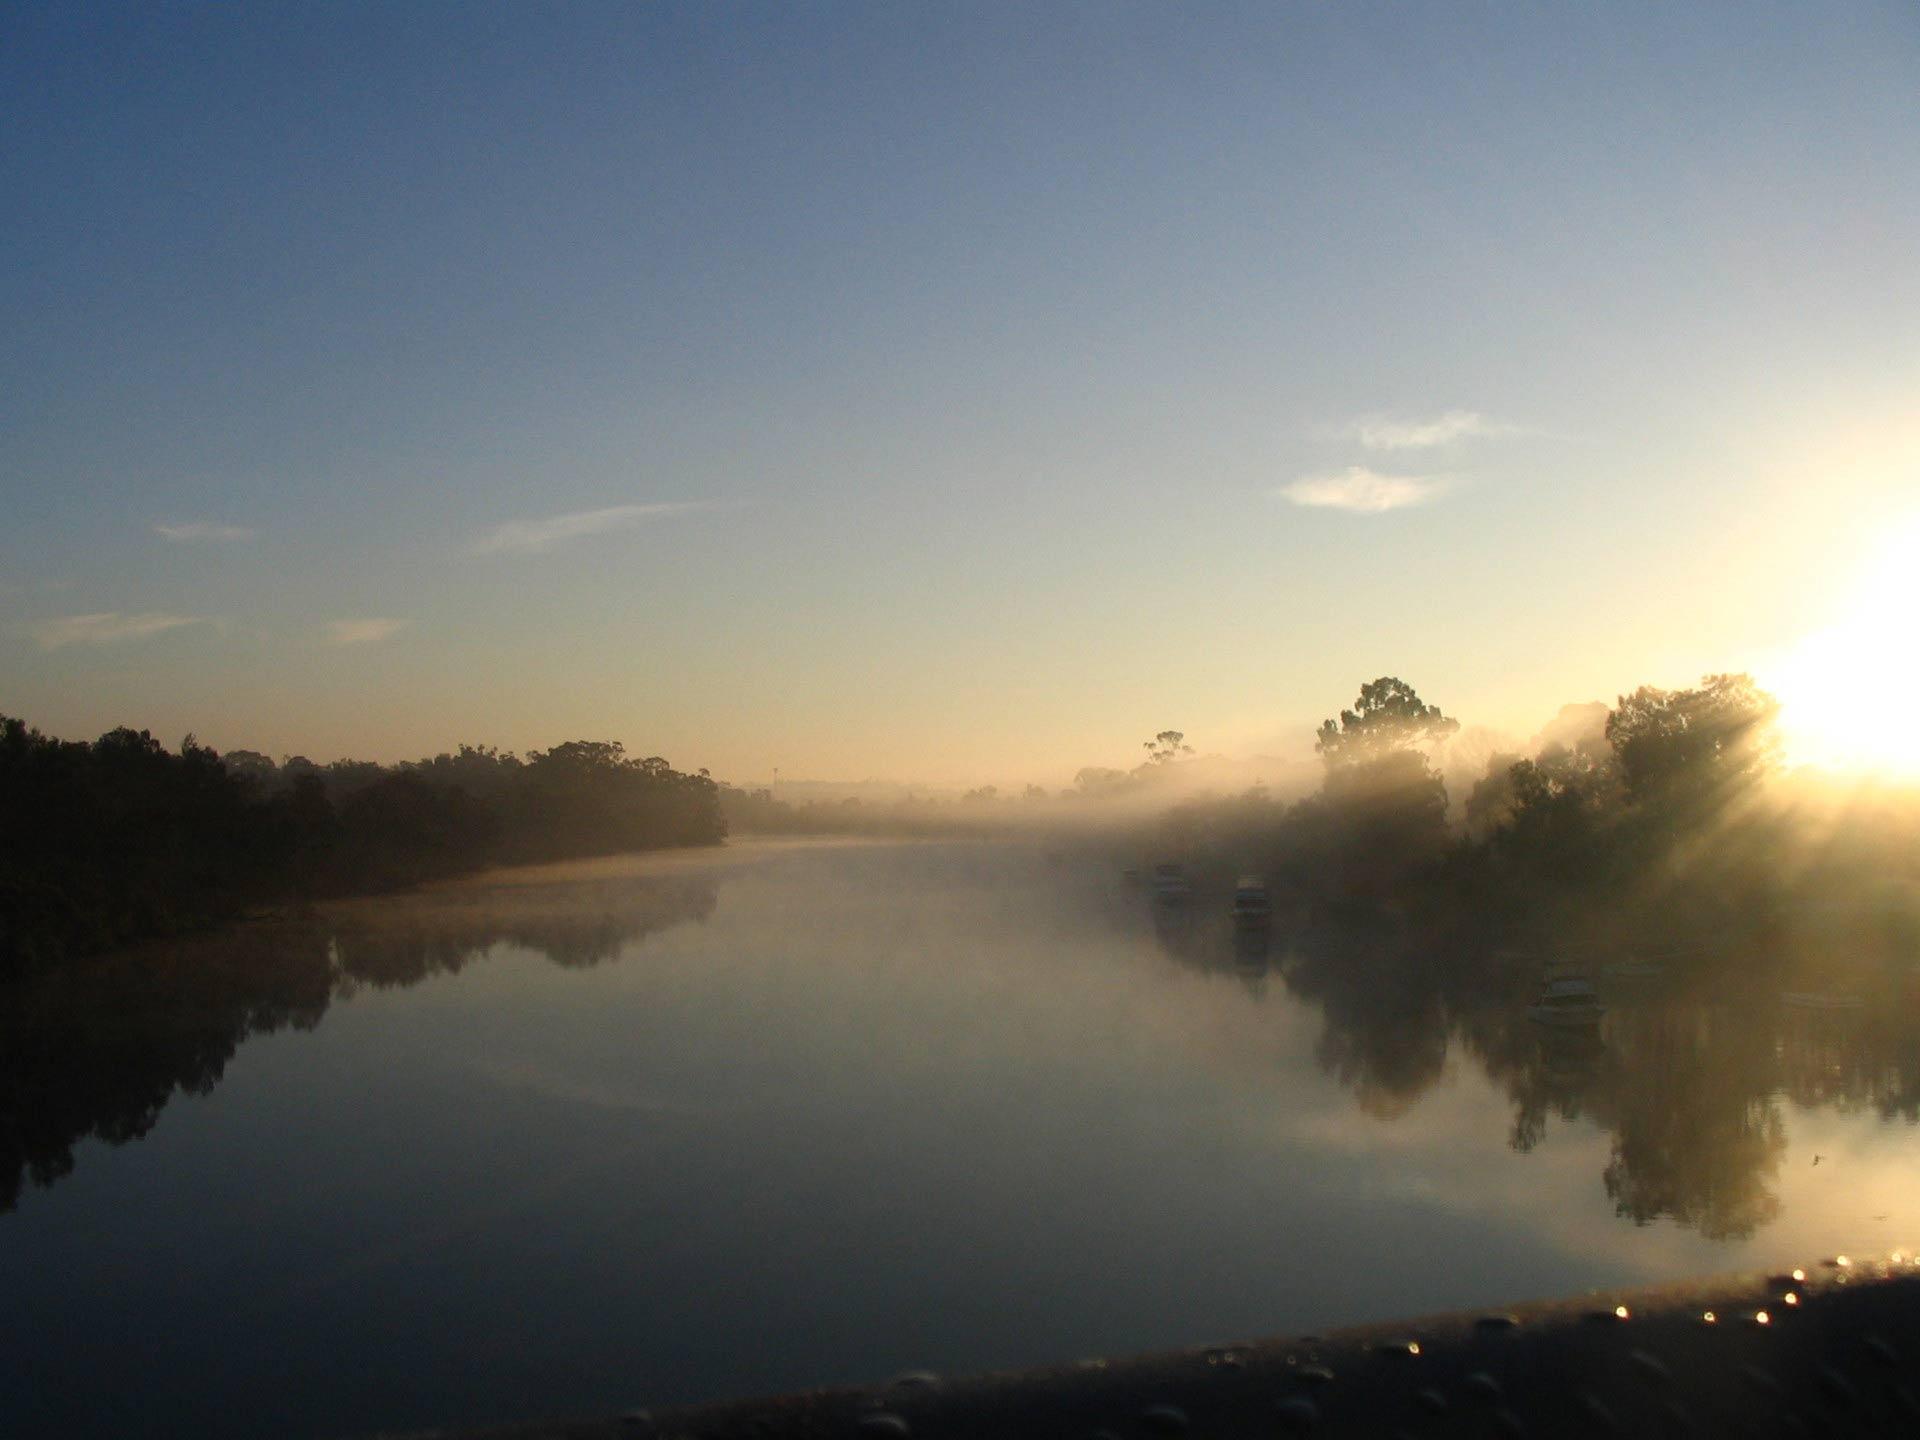 view-from-footbridge-1227832-1920x1440